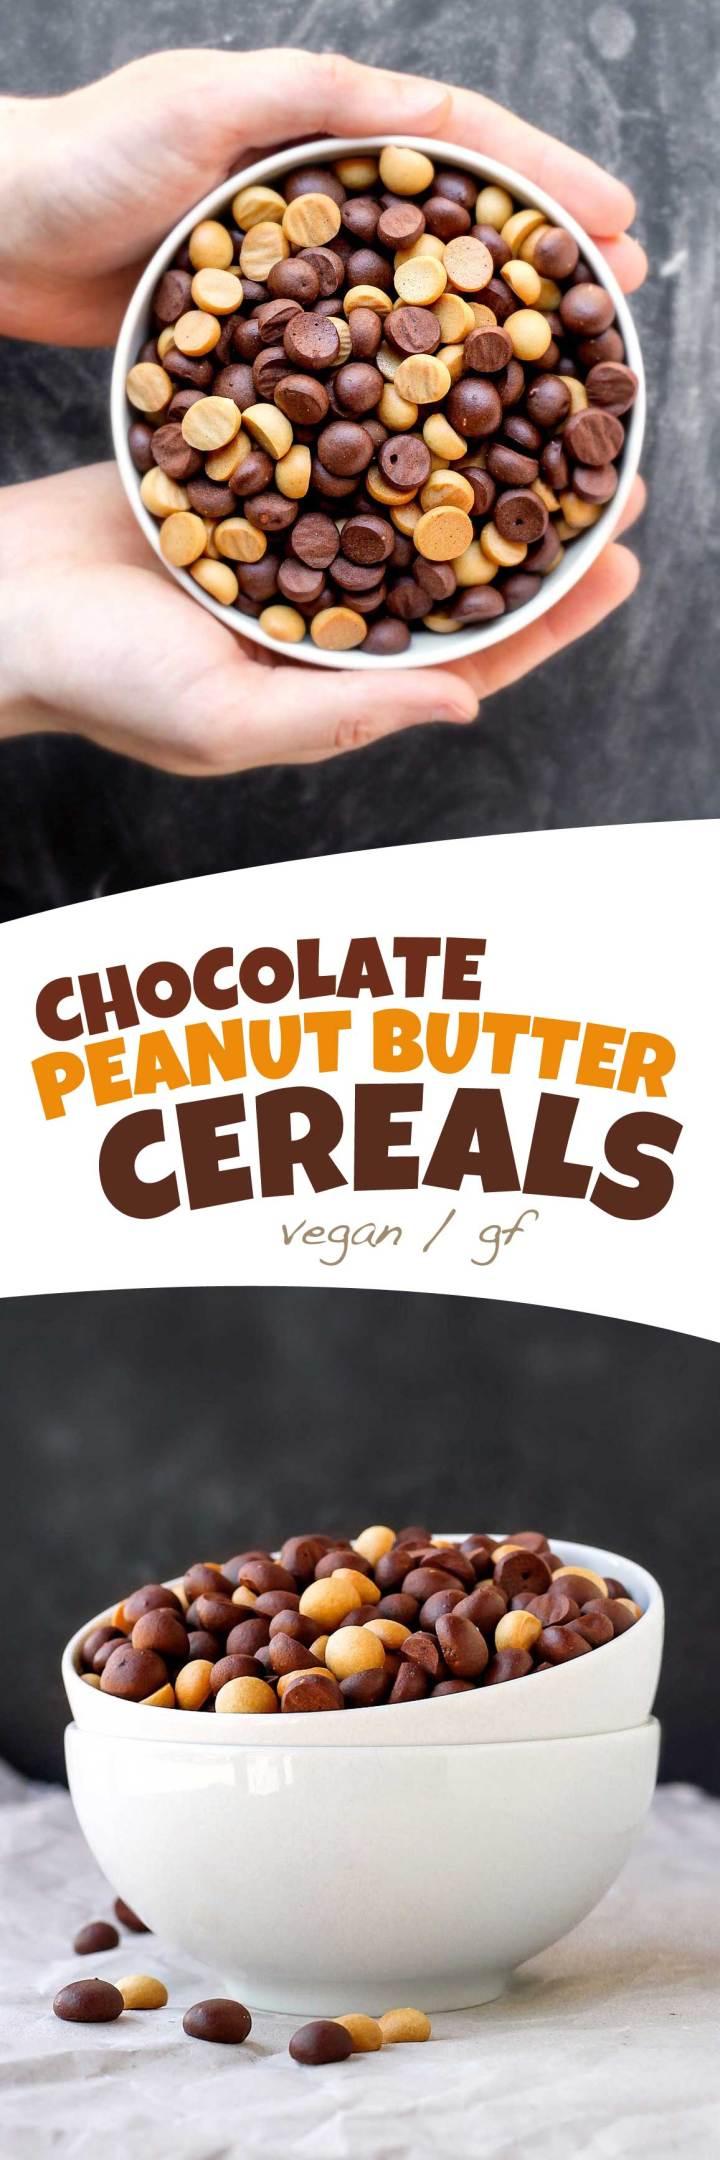 Homemade Vegan Chocolate Peanut Butter Cereals